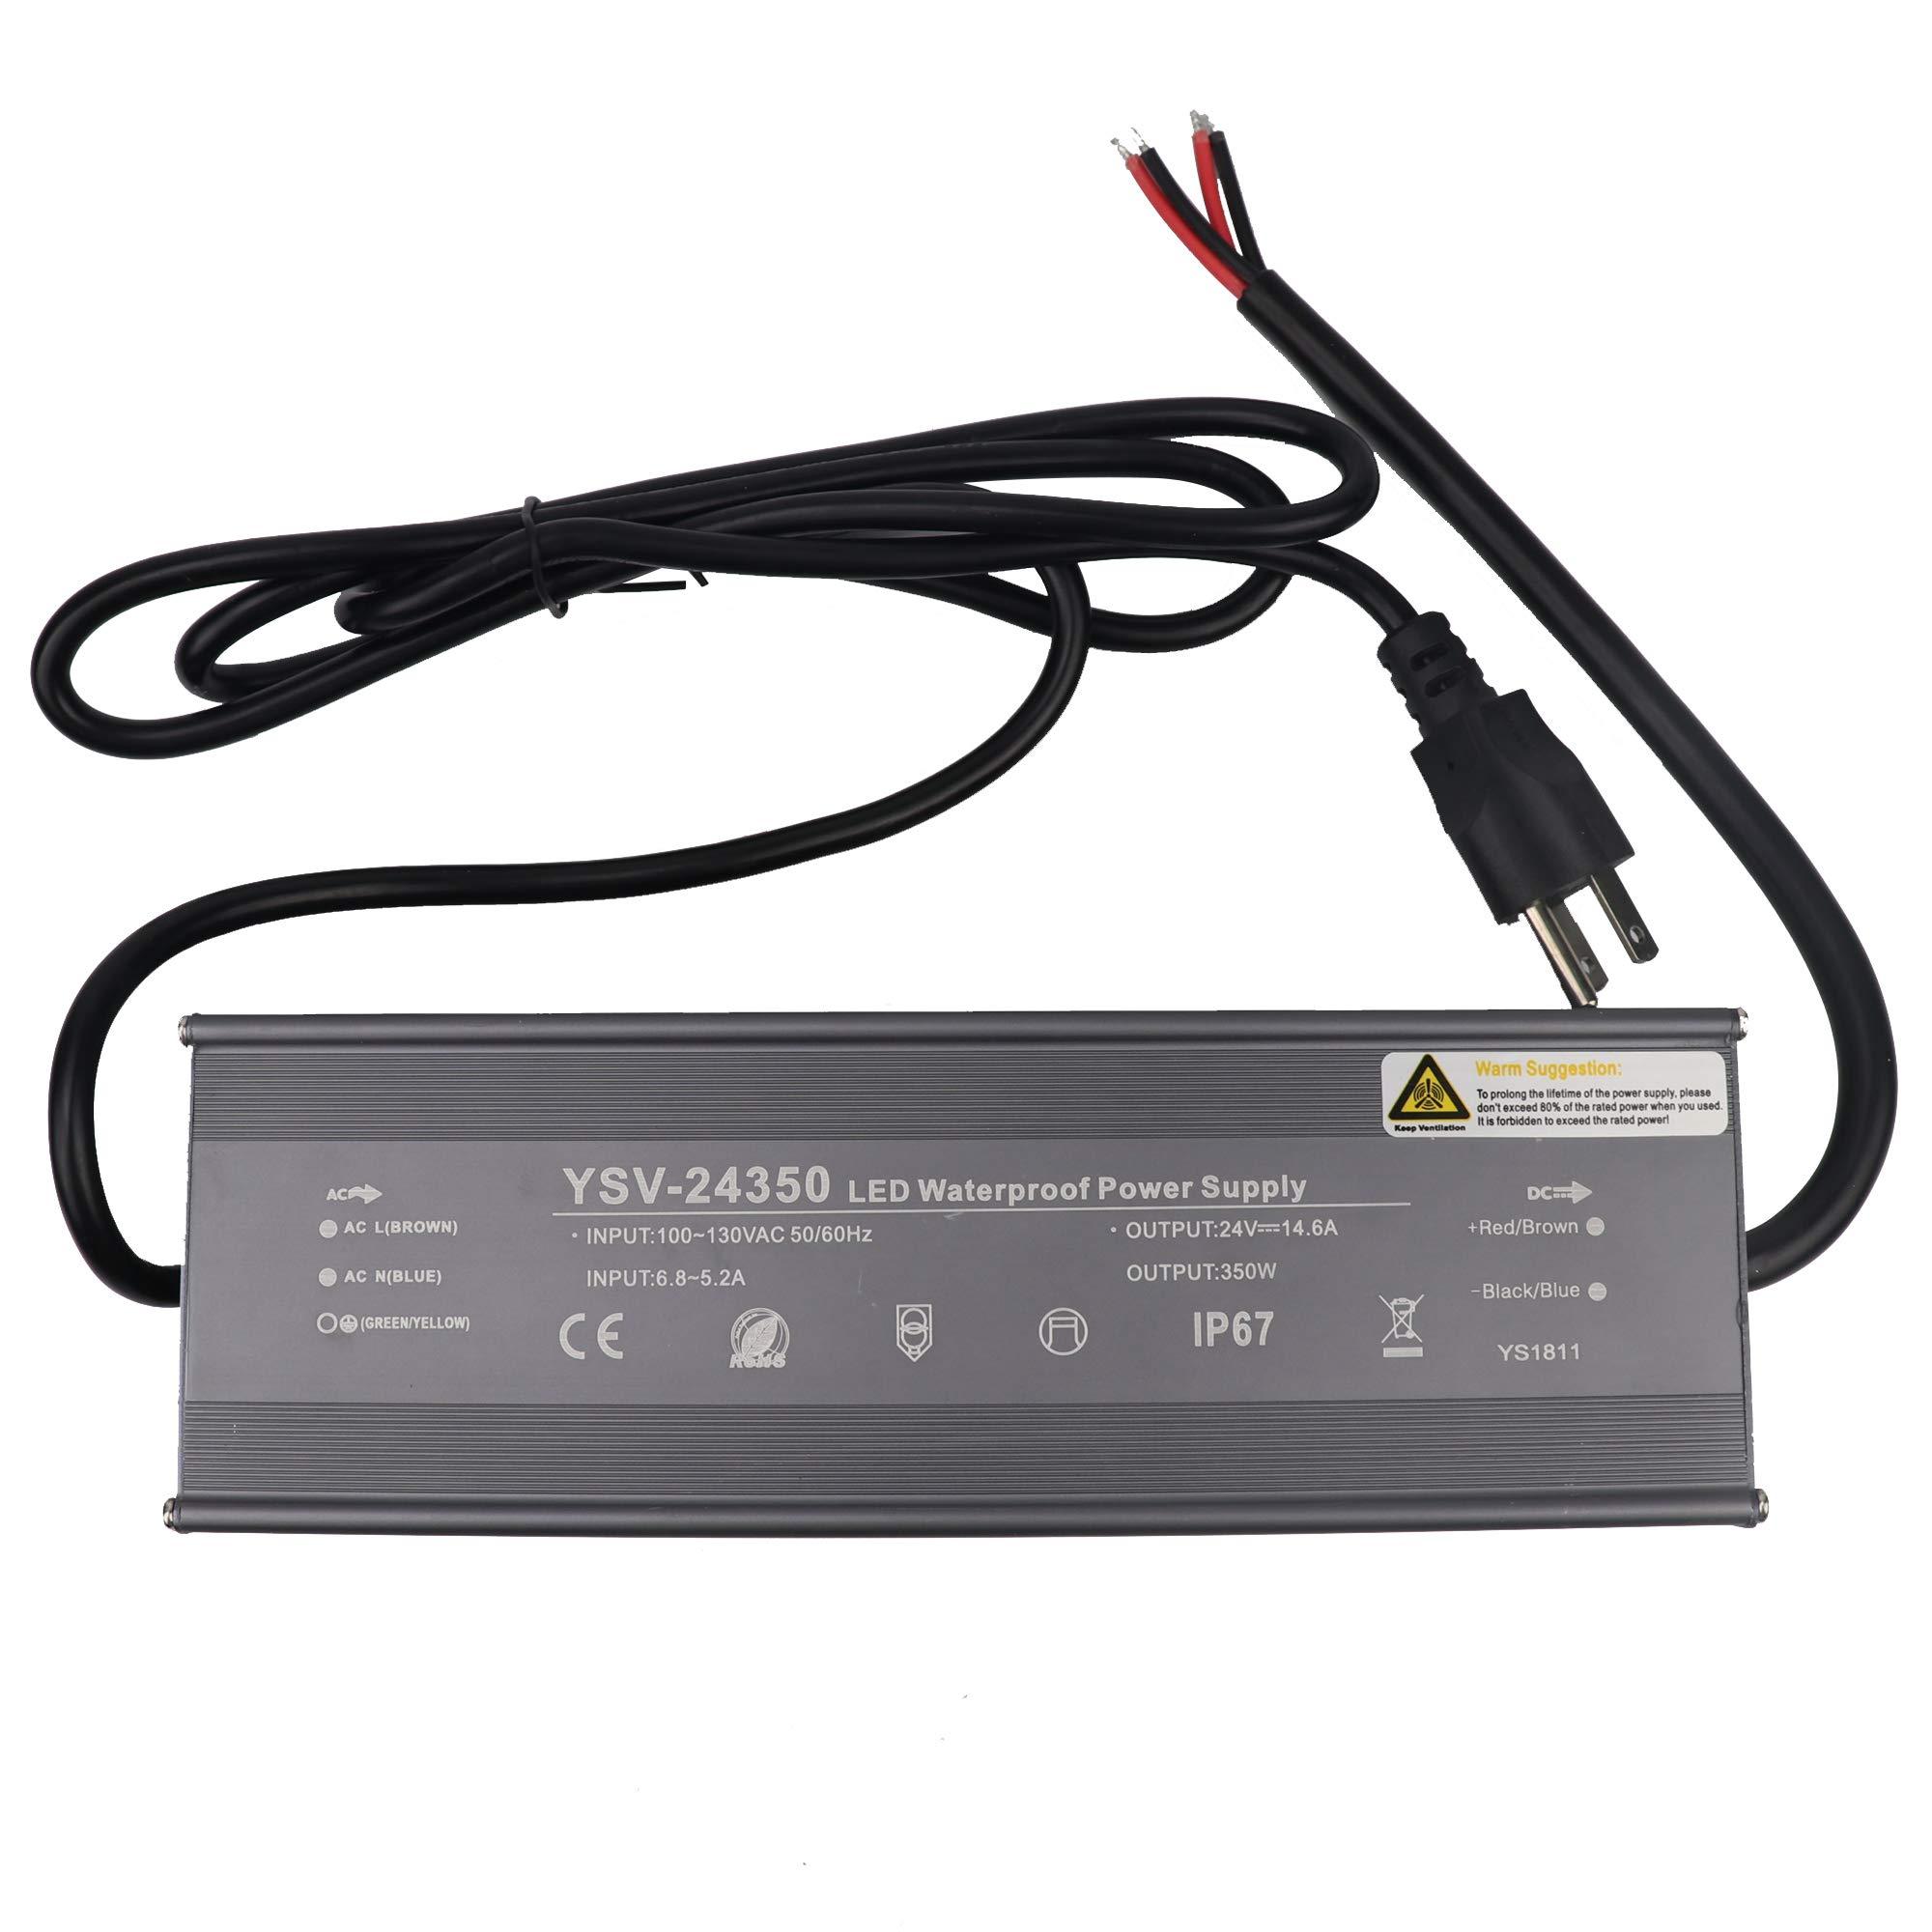 LEDENET 350 Watt Waterproof LED Power Suppply for LED Strip Light Driver Transformer Ac 100-130 Volt to 24 Volt DC Output